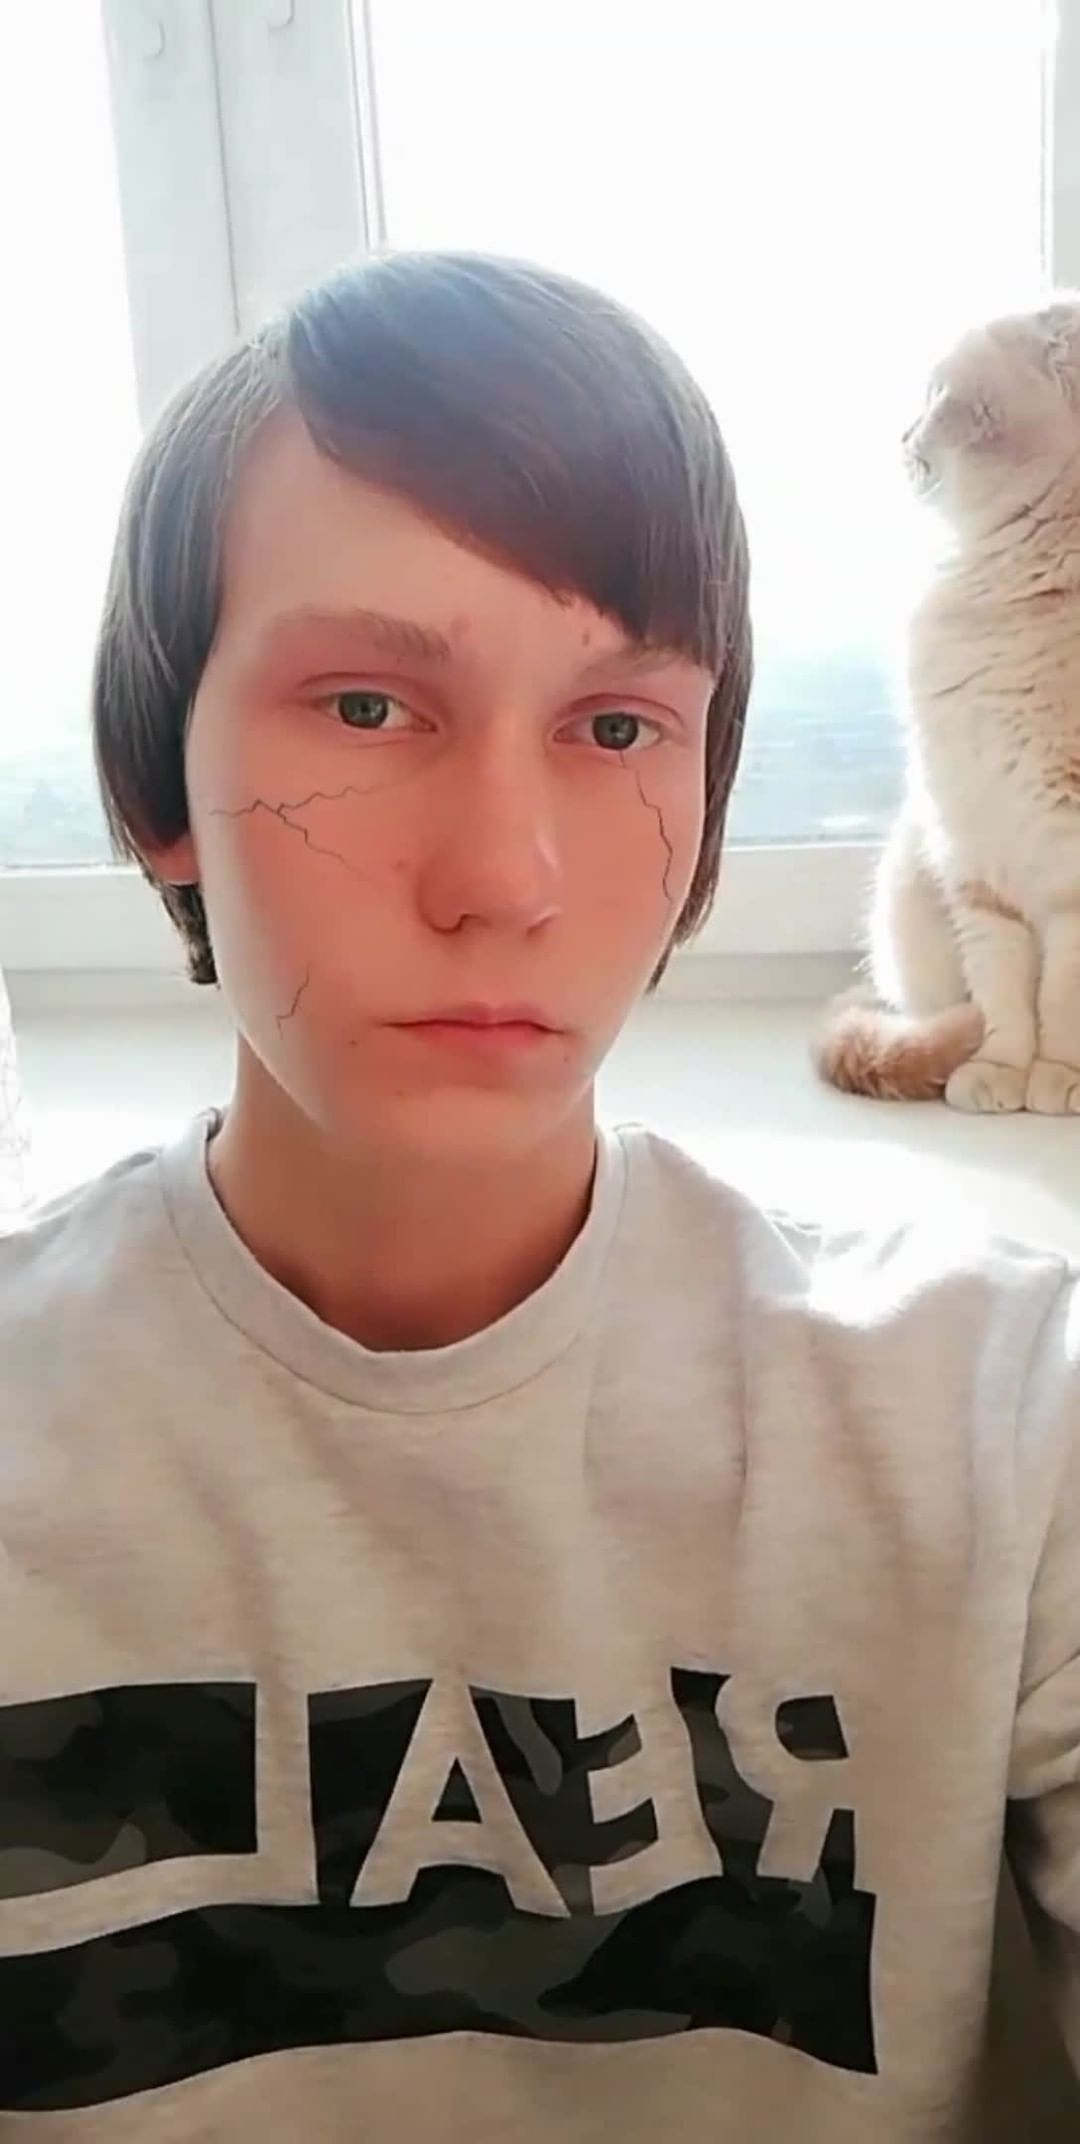 ryleevigor Instagram filter Cracked face